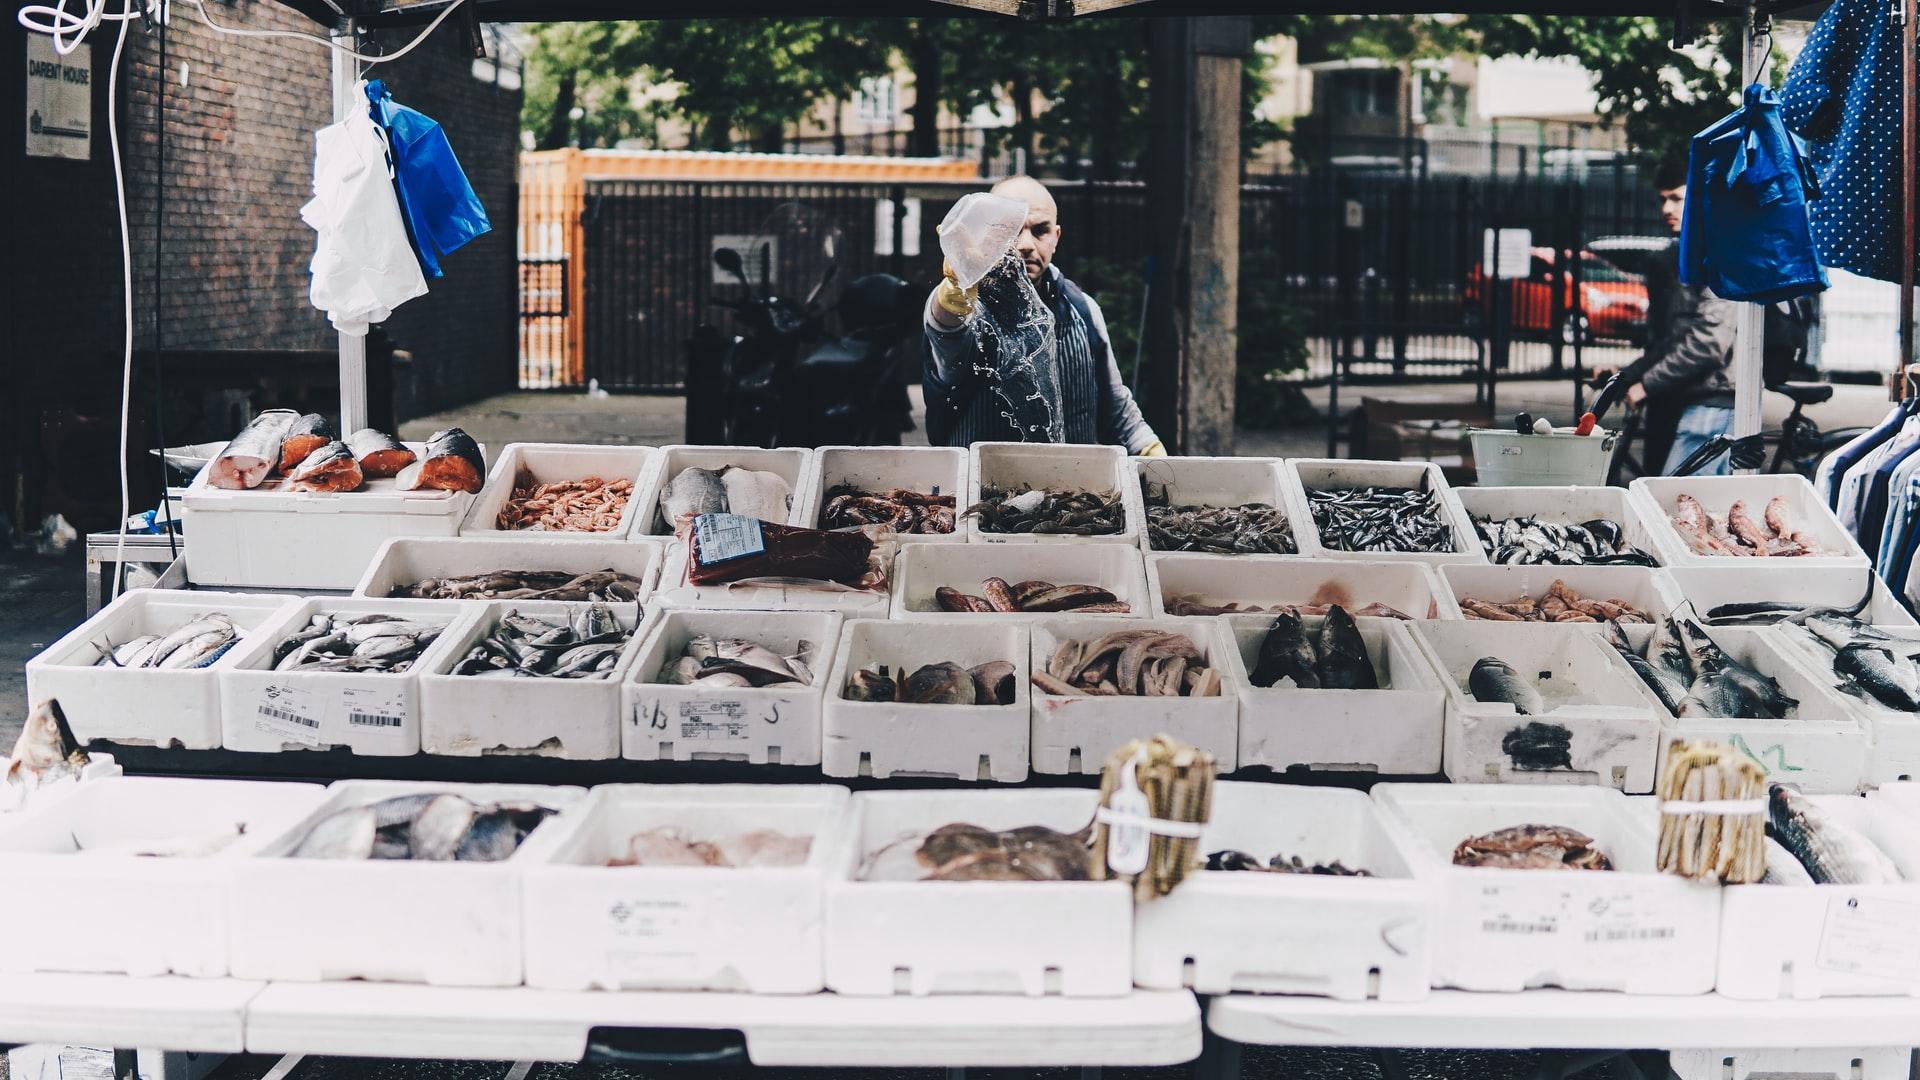 Edinburgh Fish City: A market for local fish